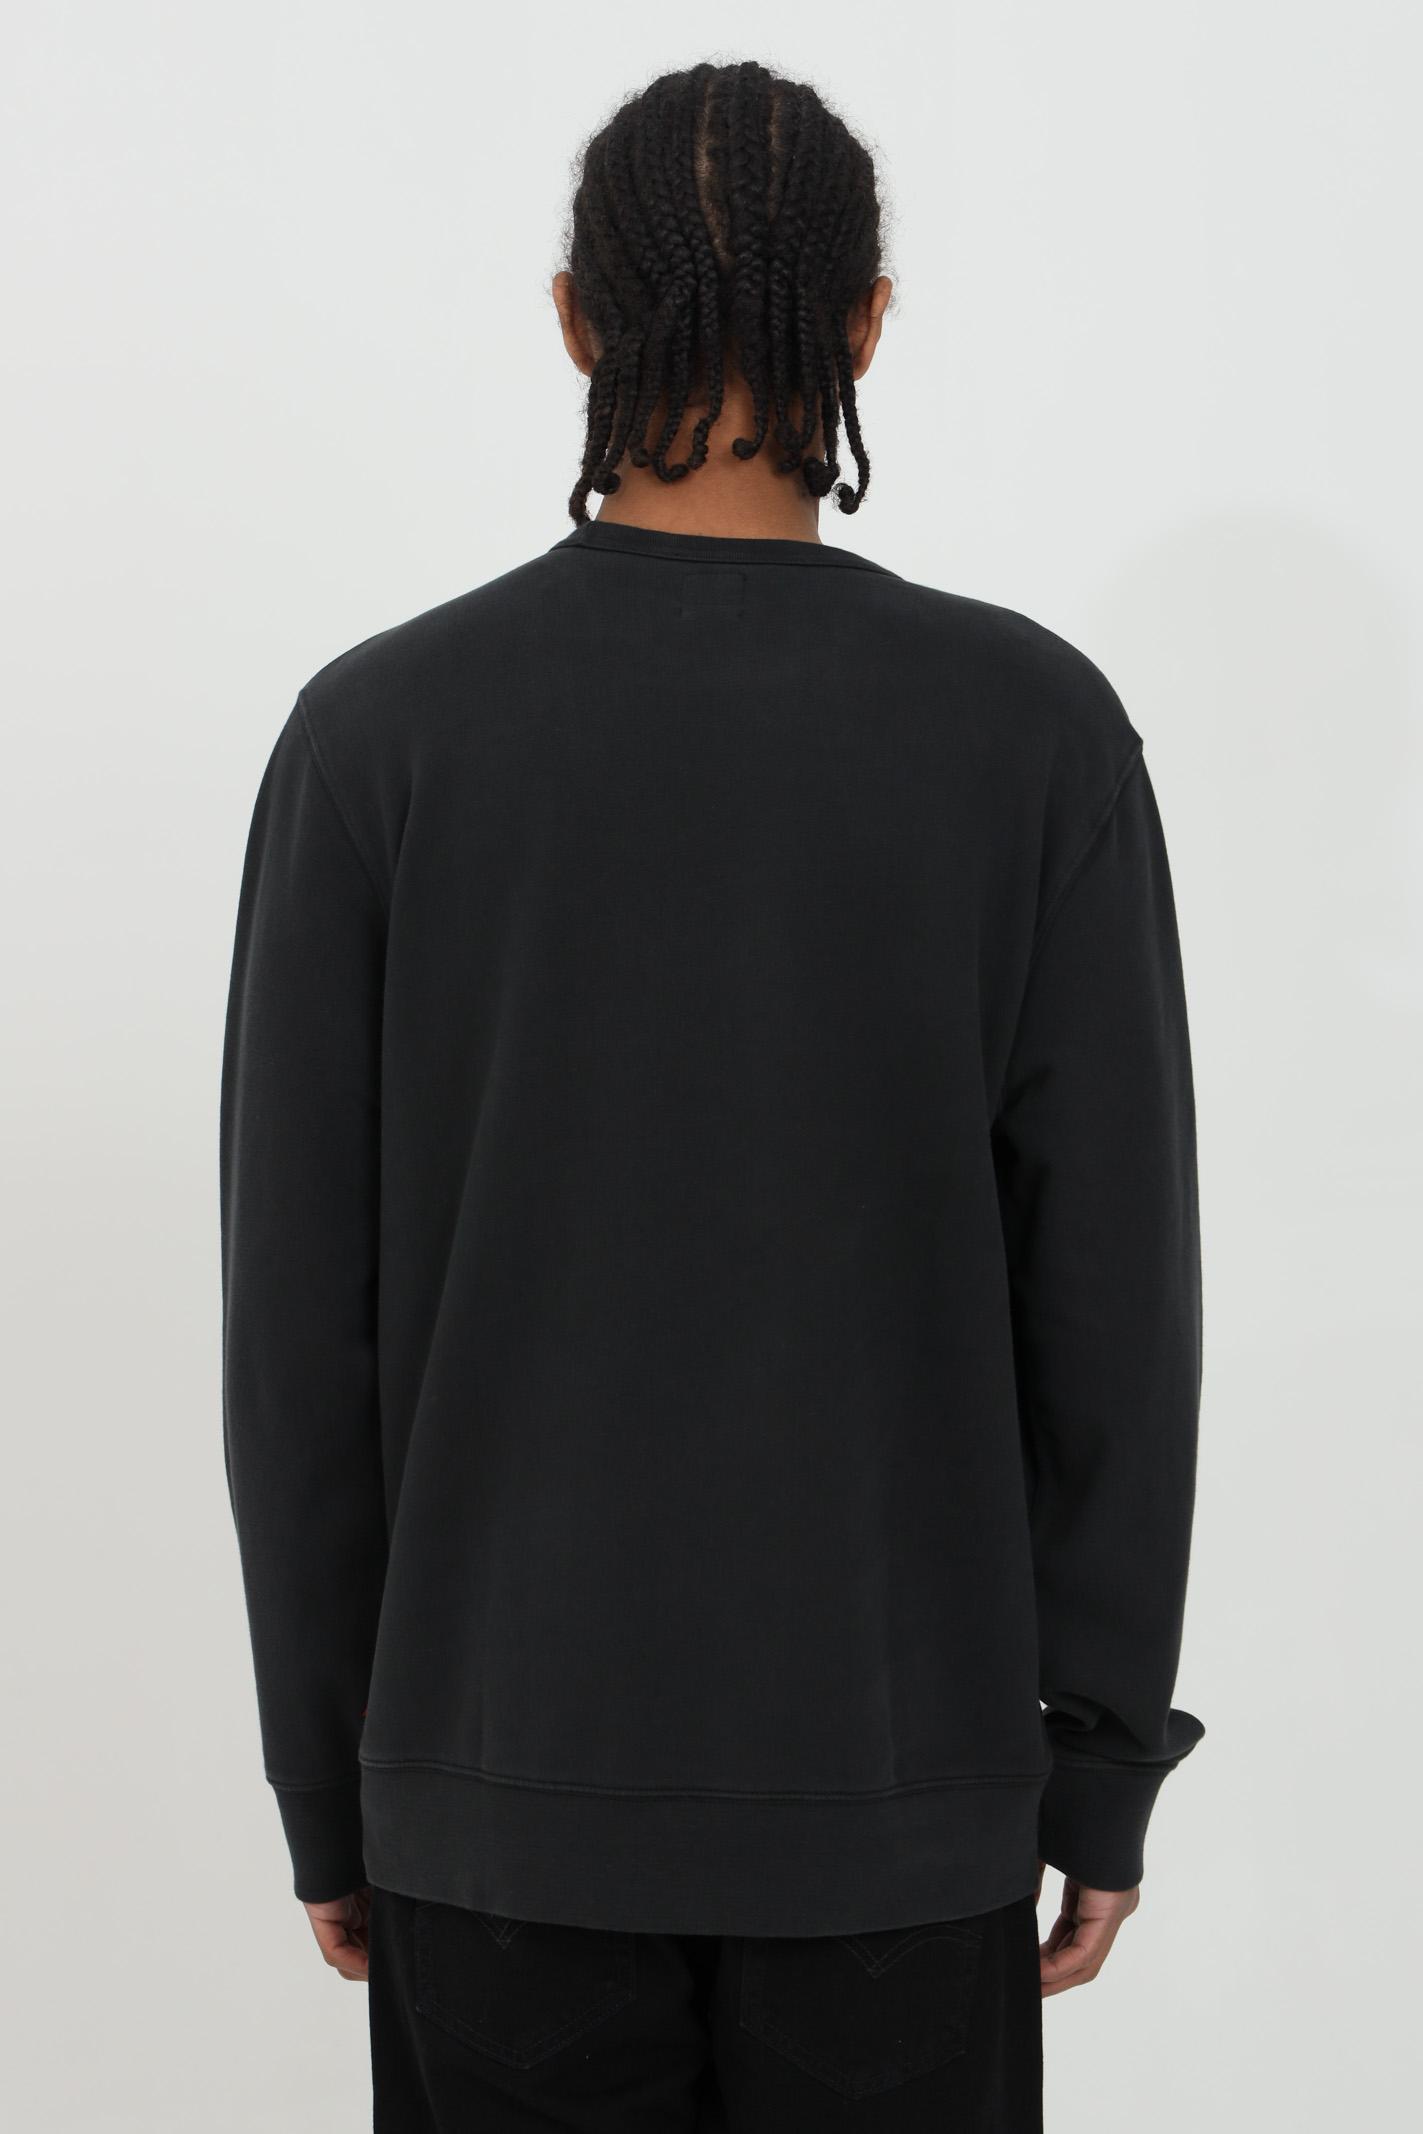 Crew neck sweatshirt with front logo LEVI'S   Sweatshirt   17895-01110111